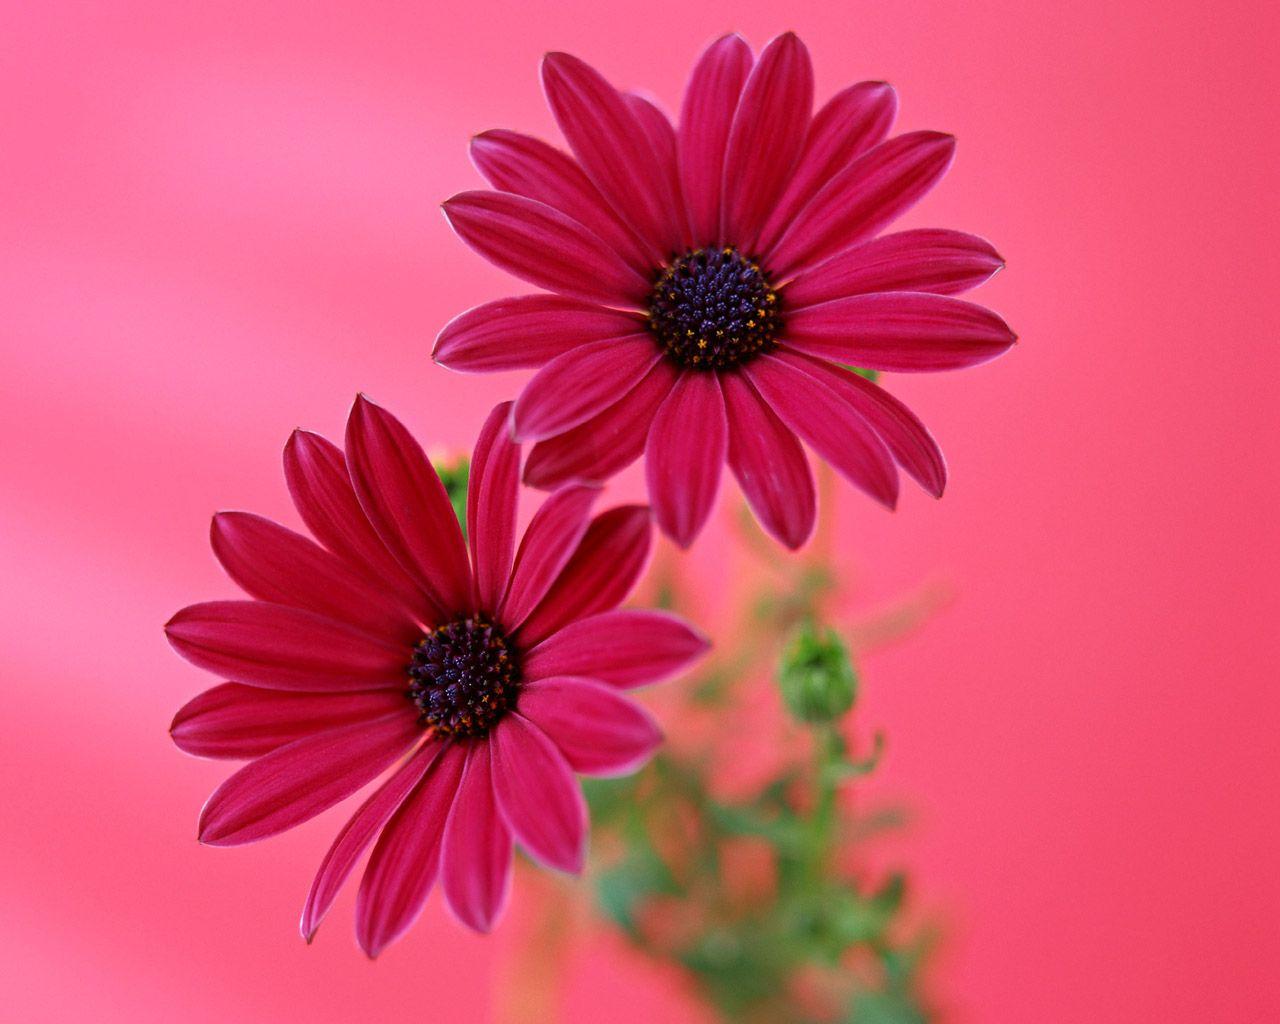 Gerbera daisy desktop flores plantas pinterest gerbera and gerbera daisy desktop izmirmasajfo